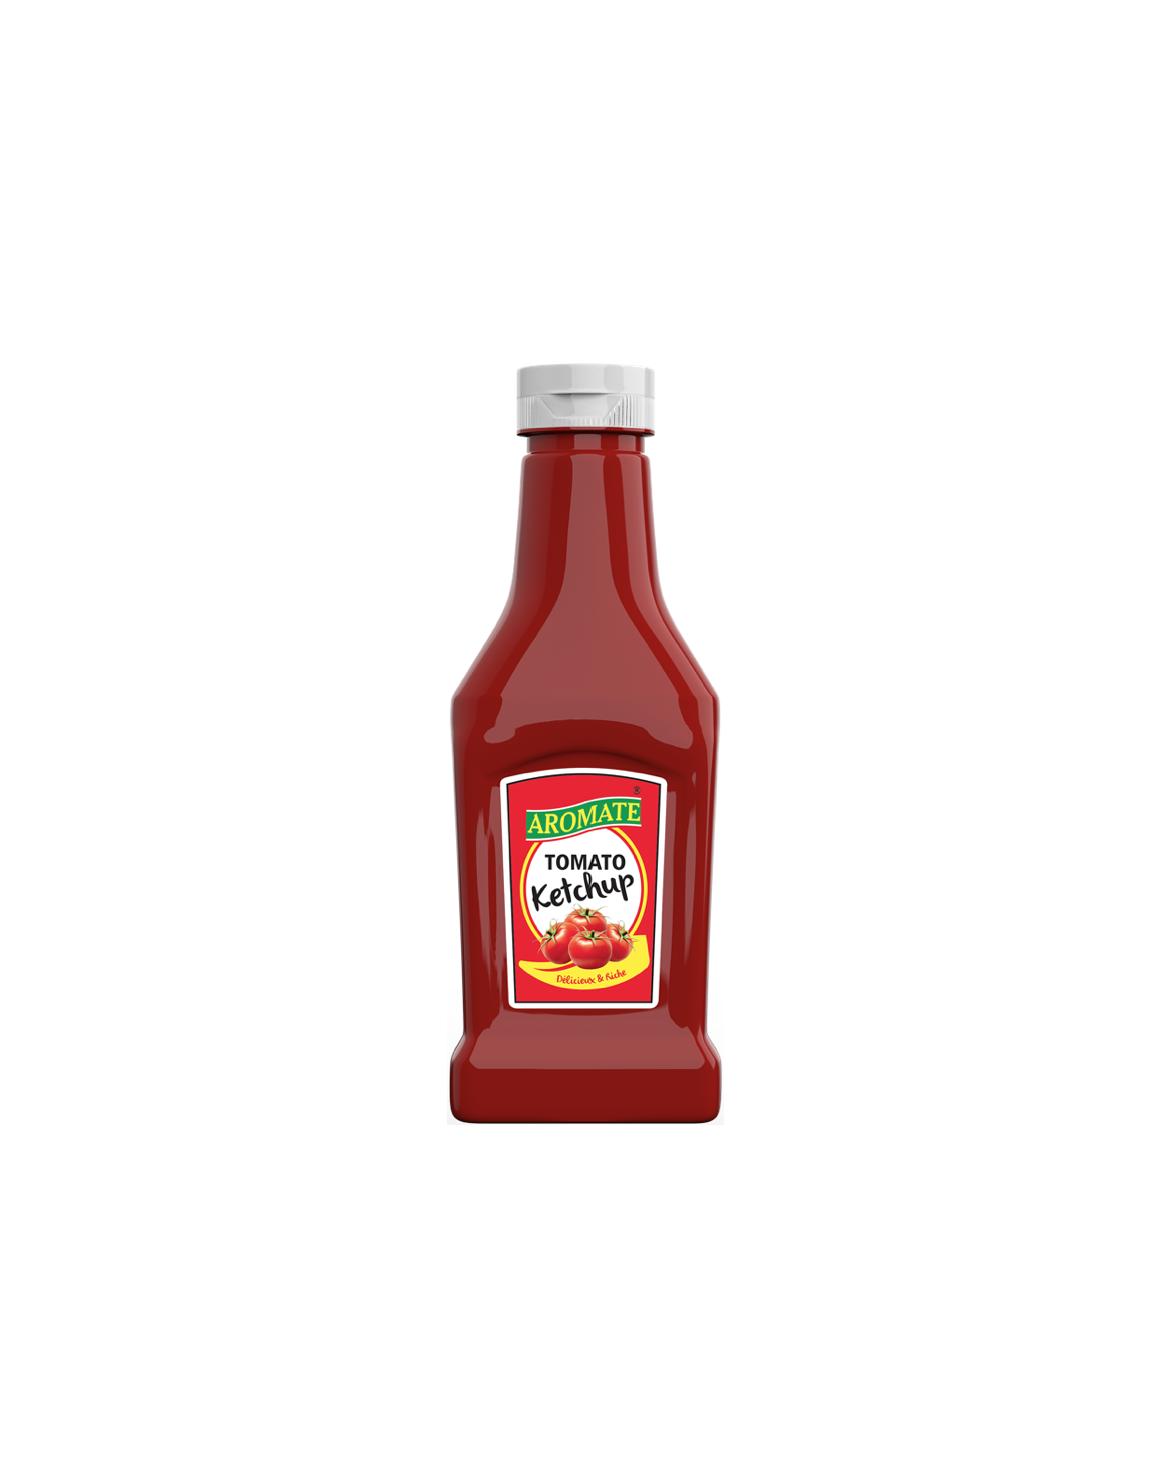 aromate_ketchup-350ml_Siprochim